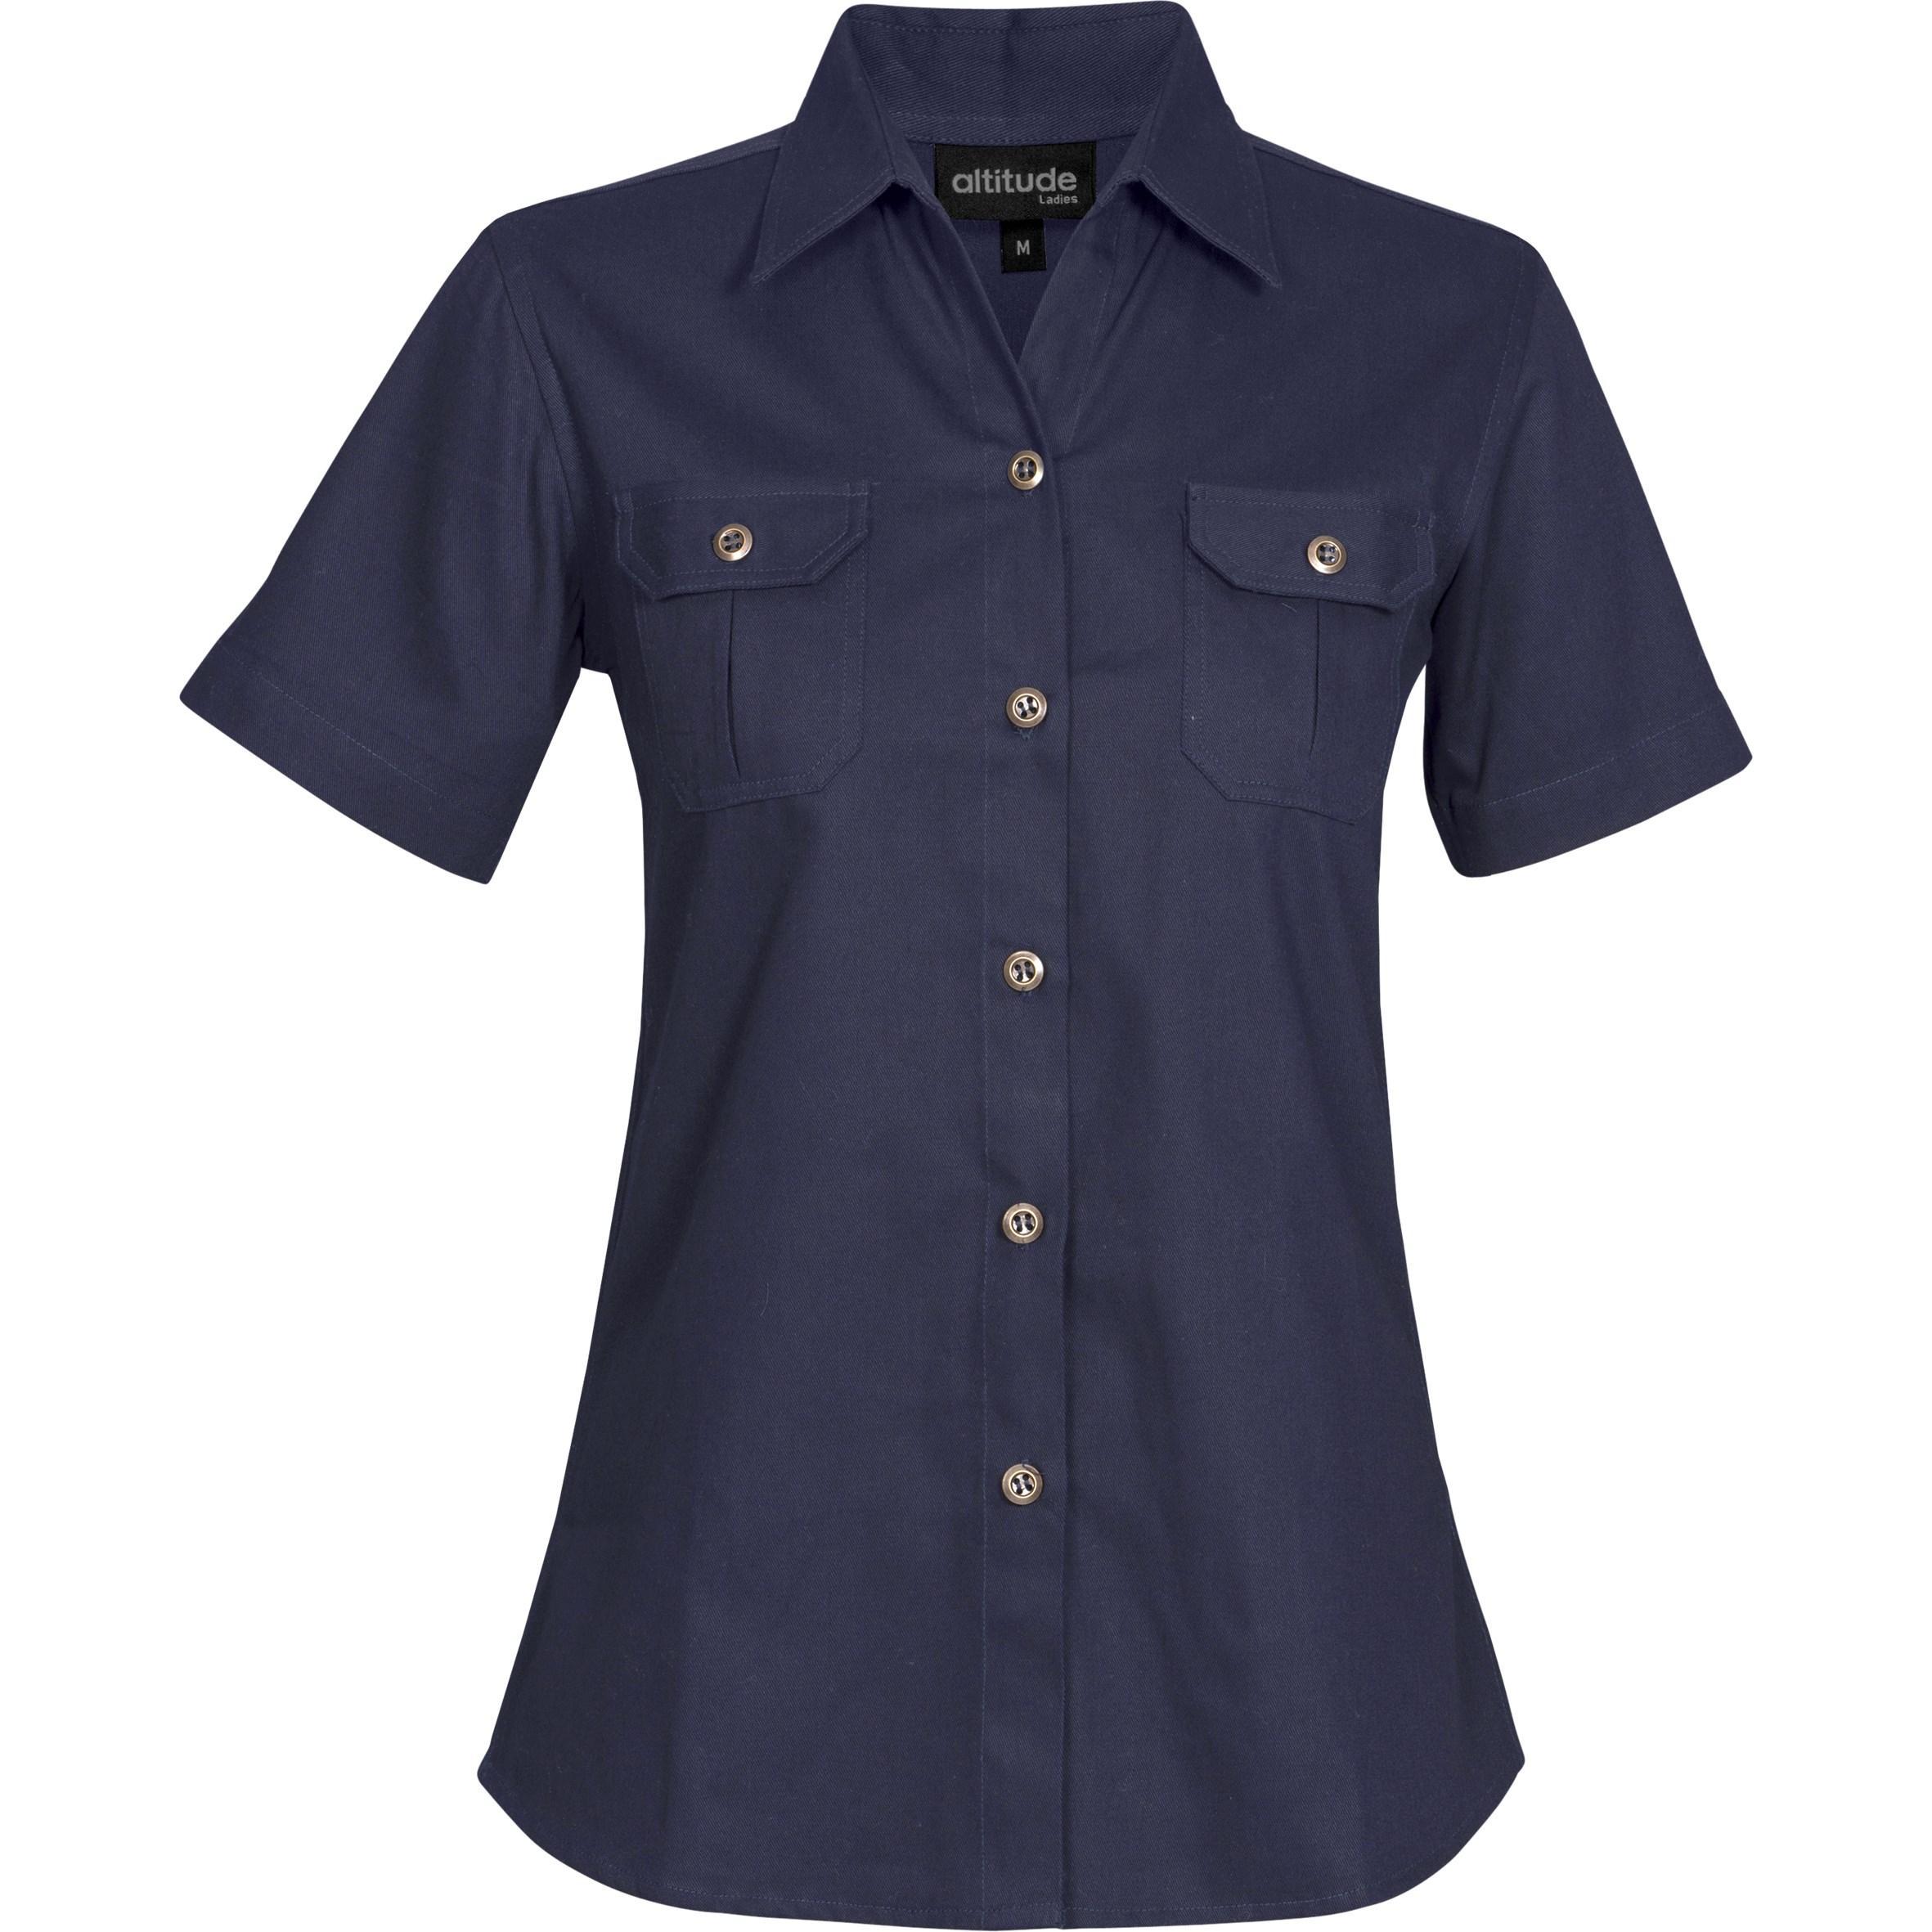 Ladies Short Sleeve Oryx Bush Shirt - Navy Only